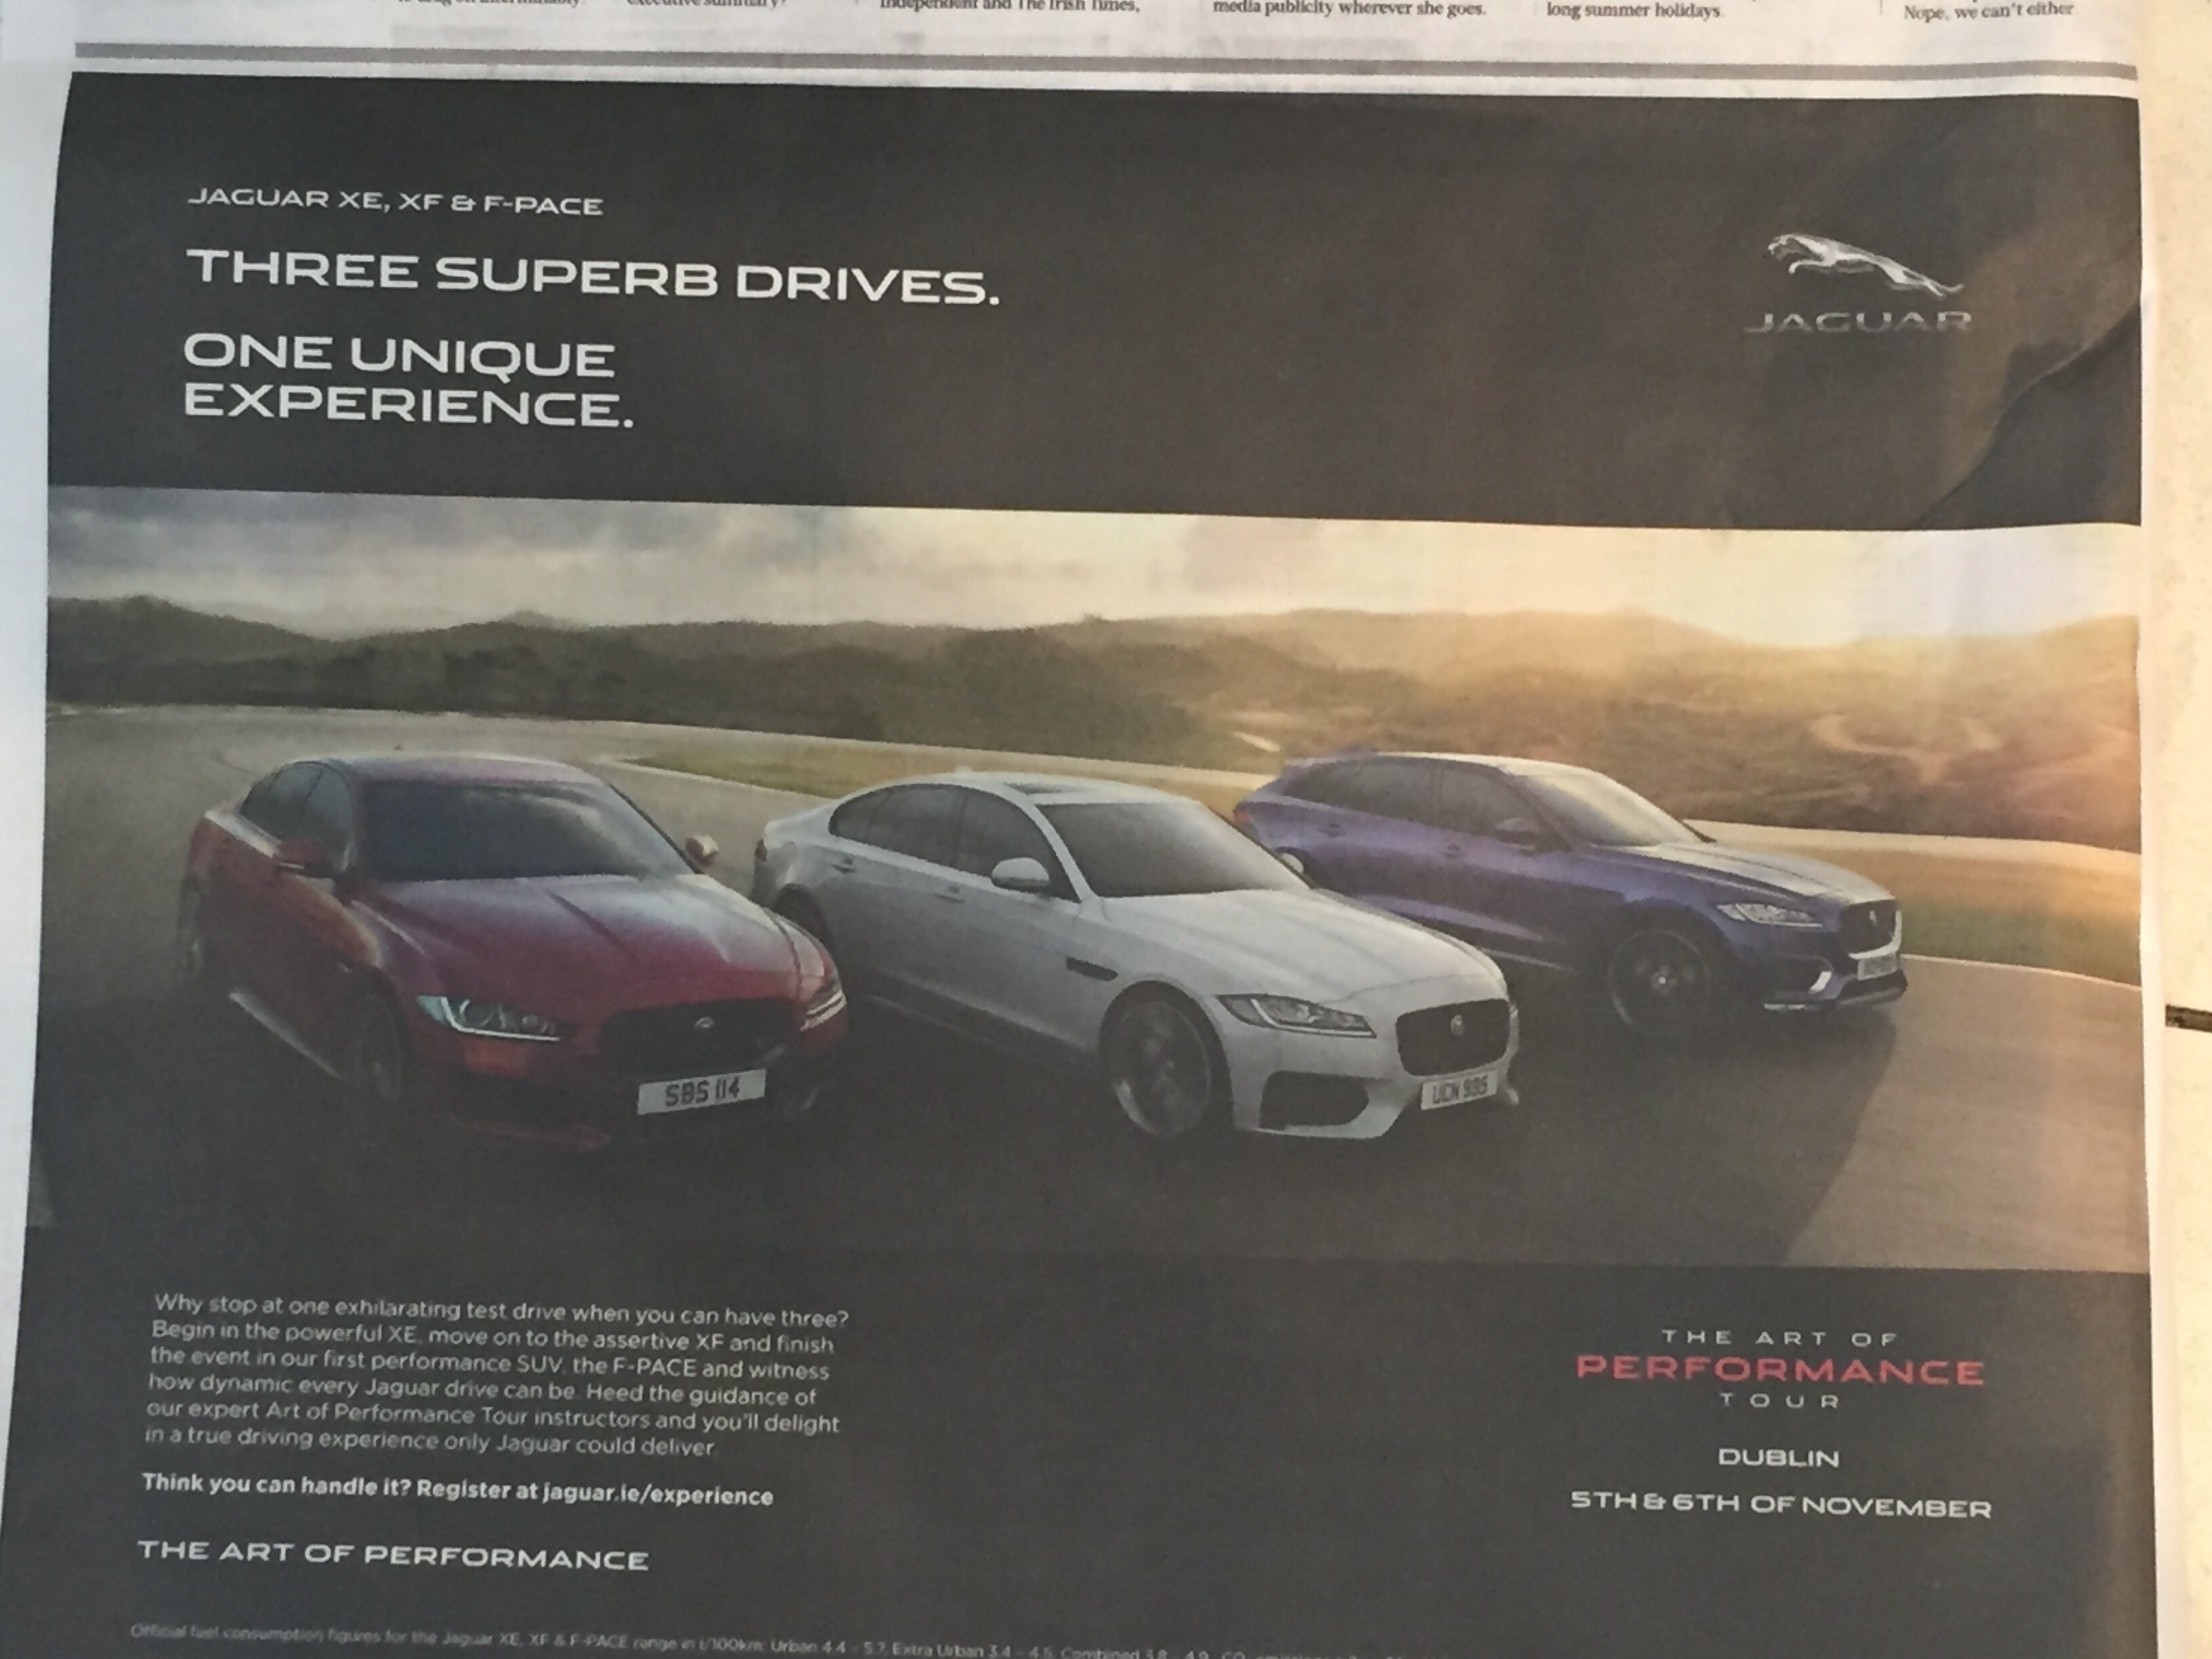 Jaguar – three superb drives. One unique experience.